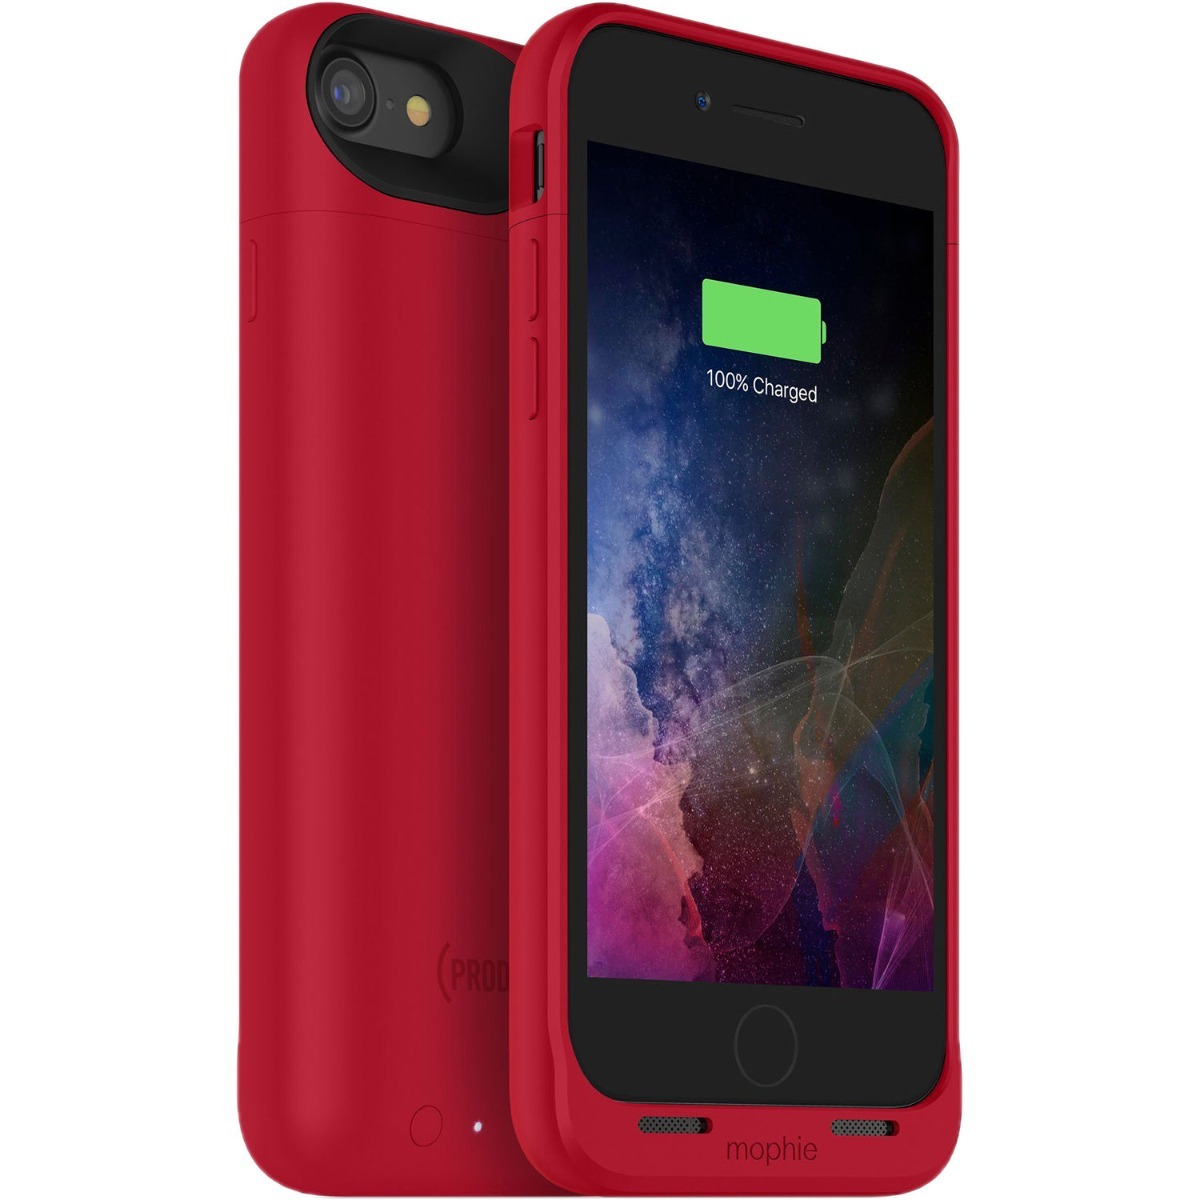 e46cc3c0028 funda batería para iphone 7 & 8 juice pack air roja - mophie. Cargando zoom.